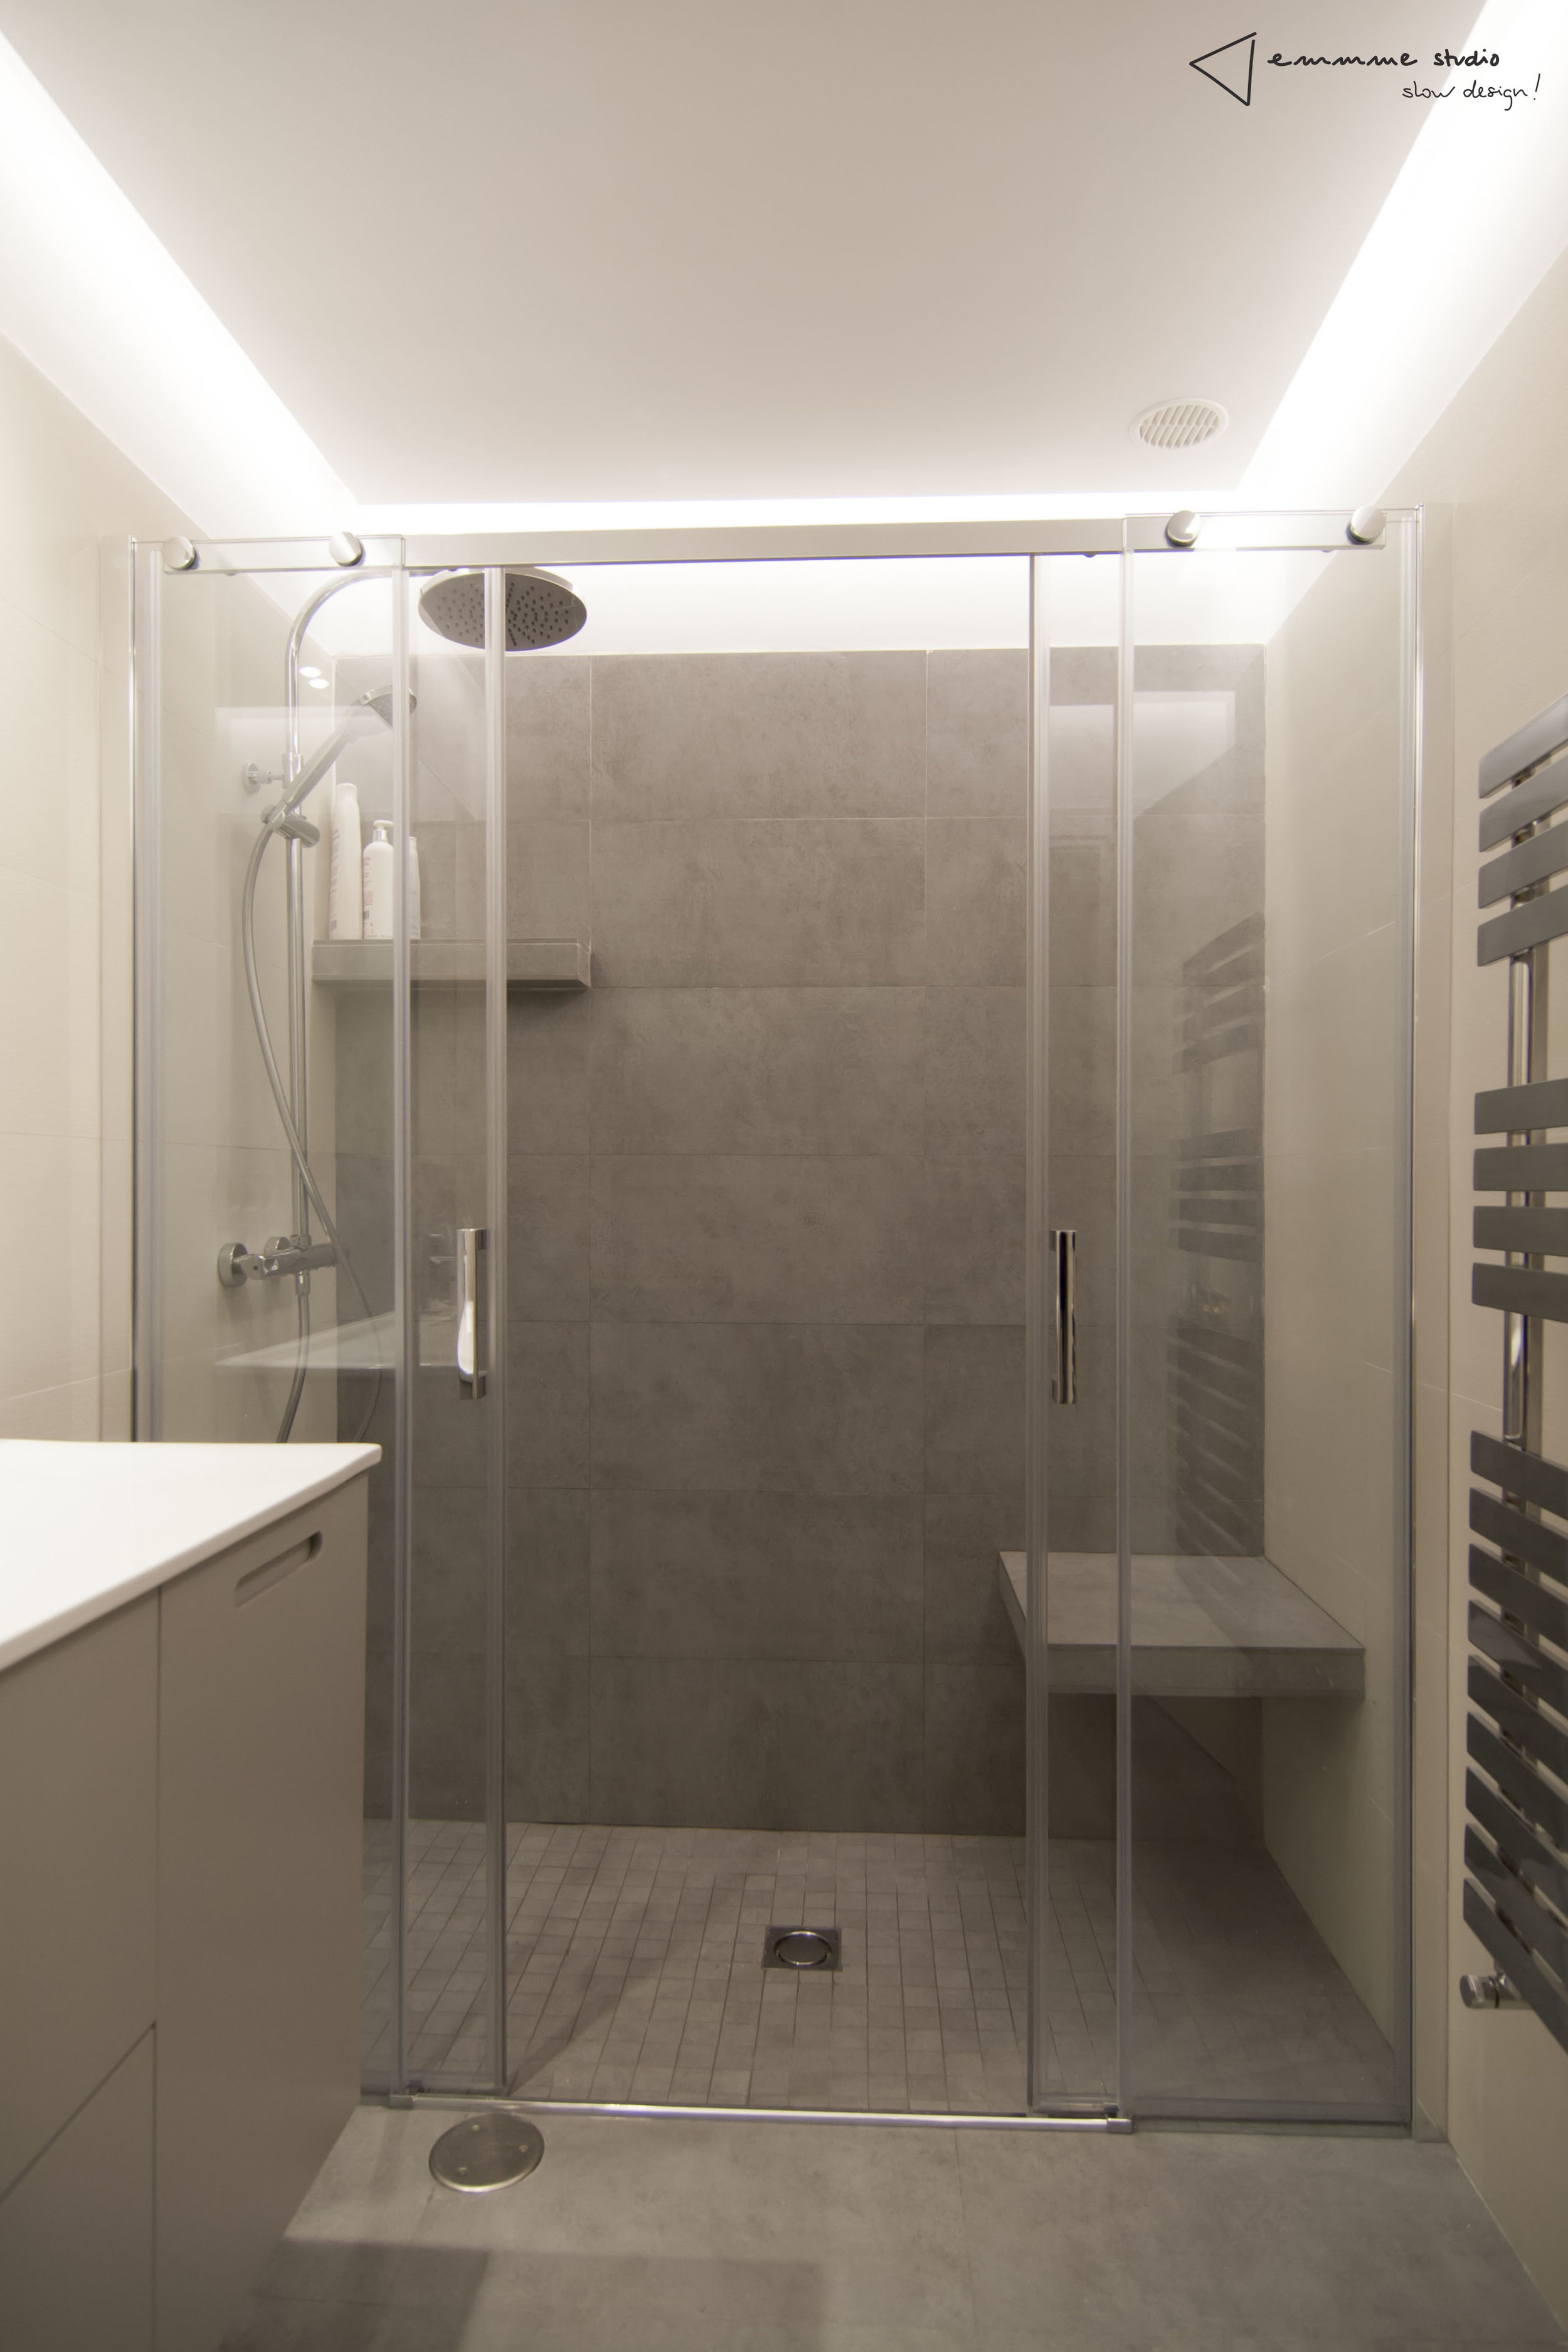 emmme studio reforma baño Carmen03.jpg